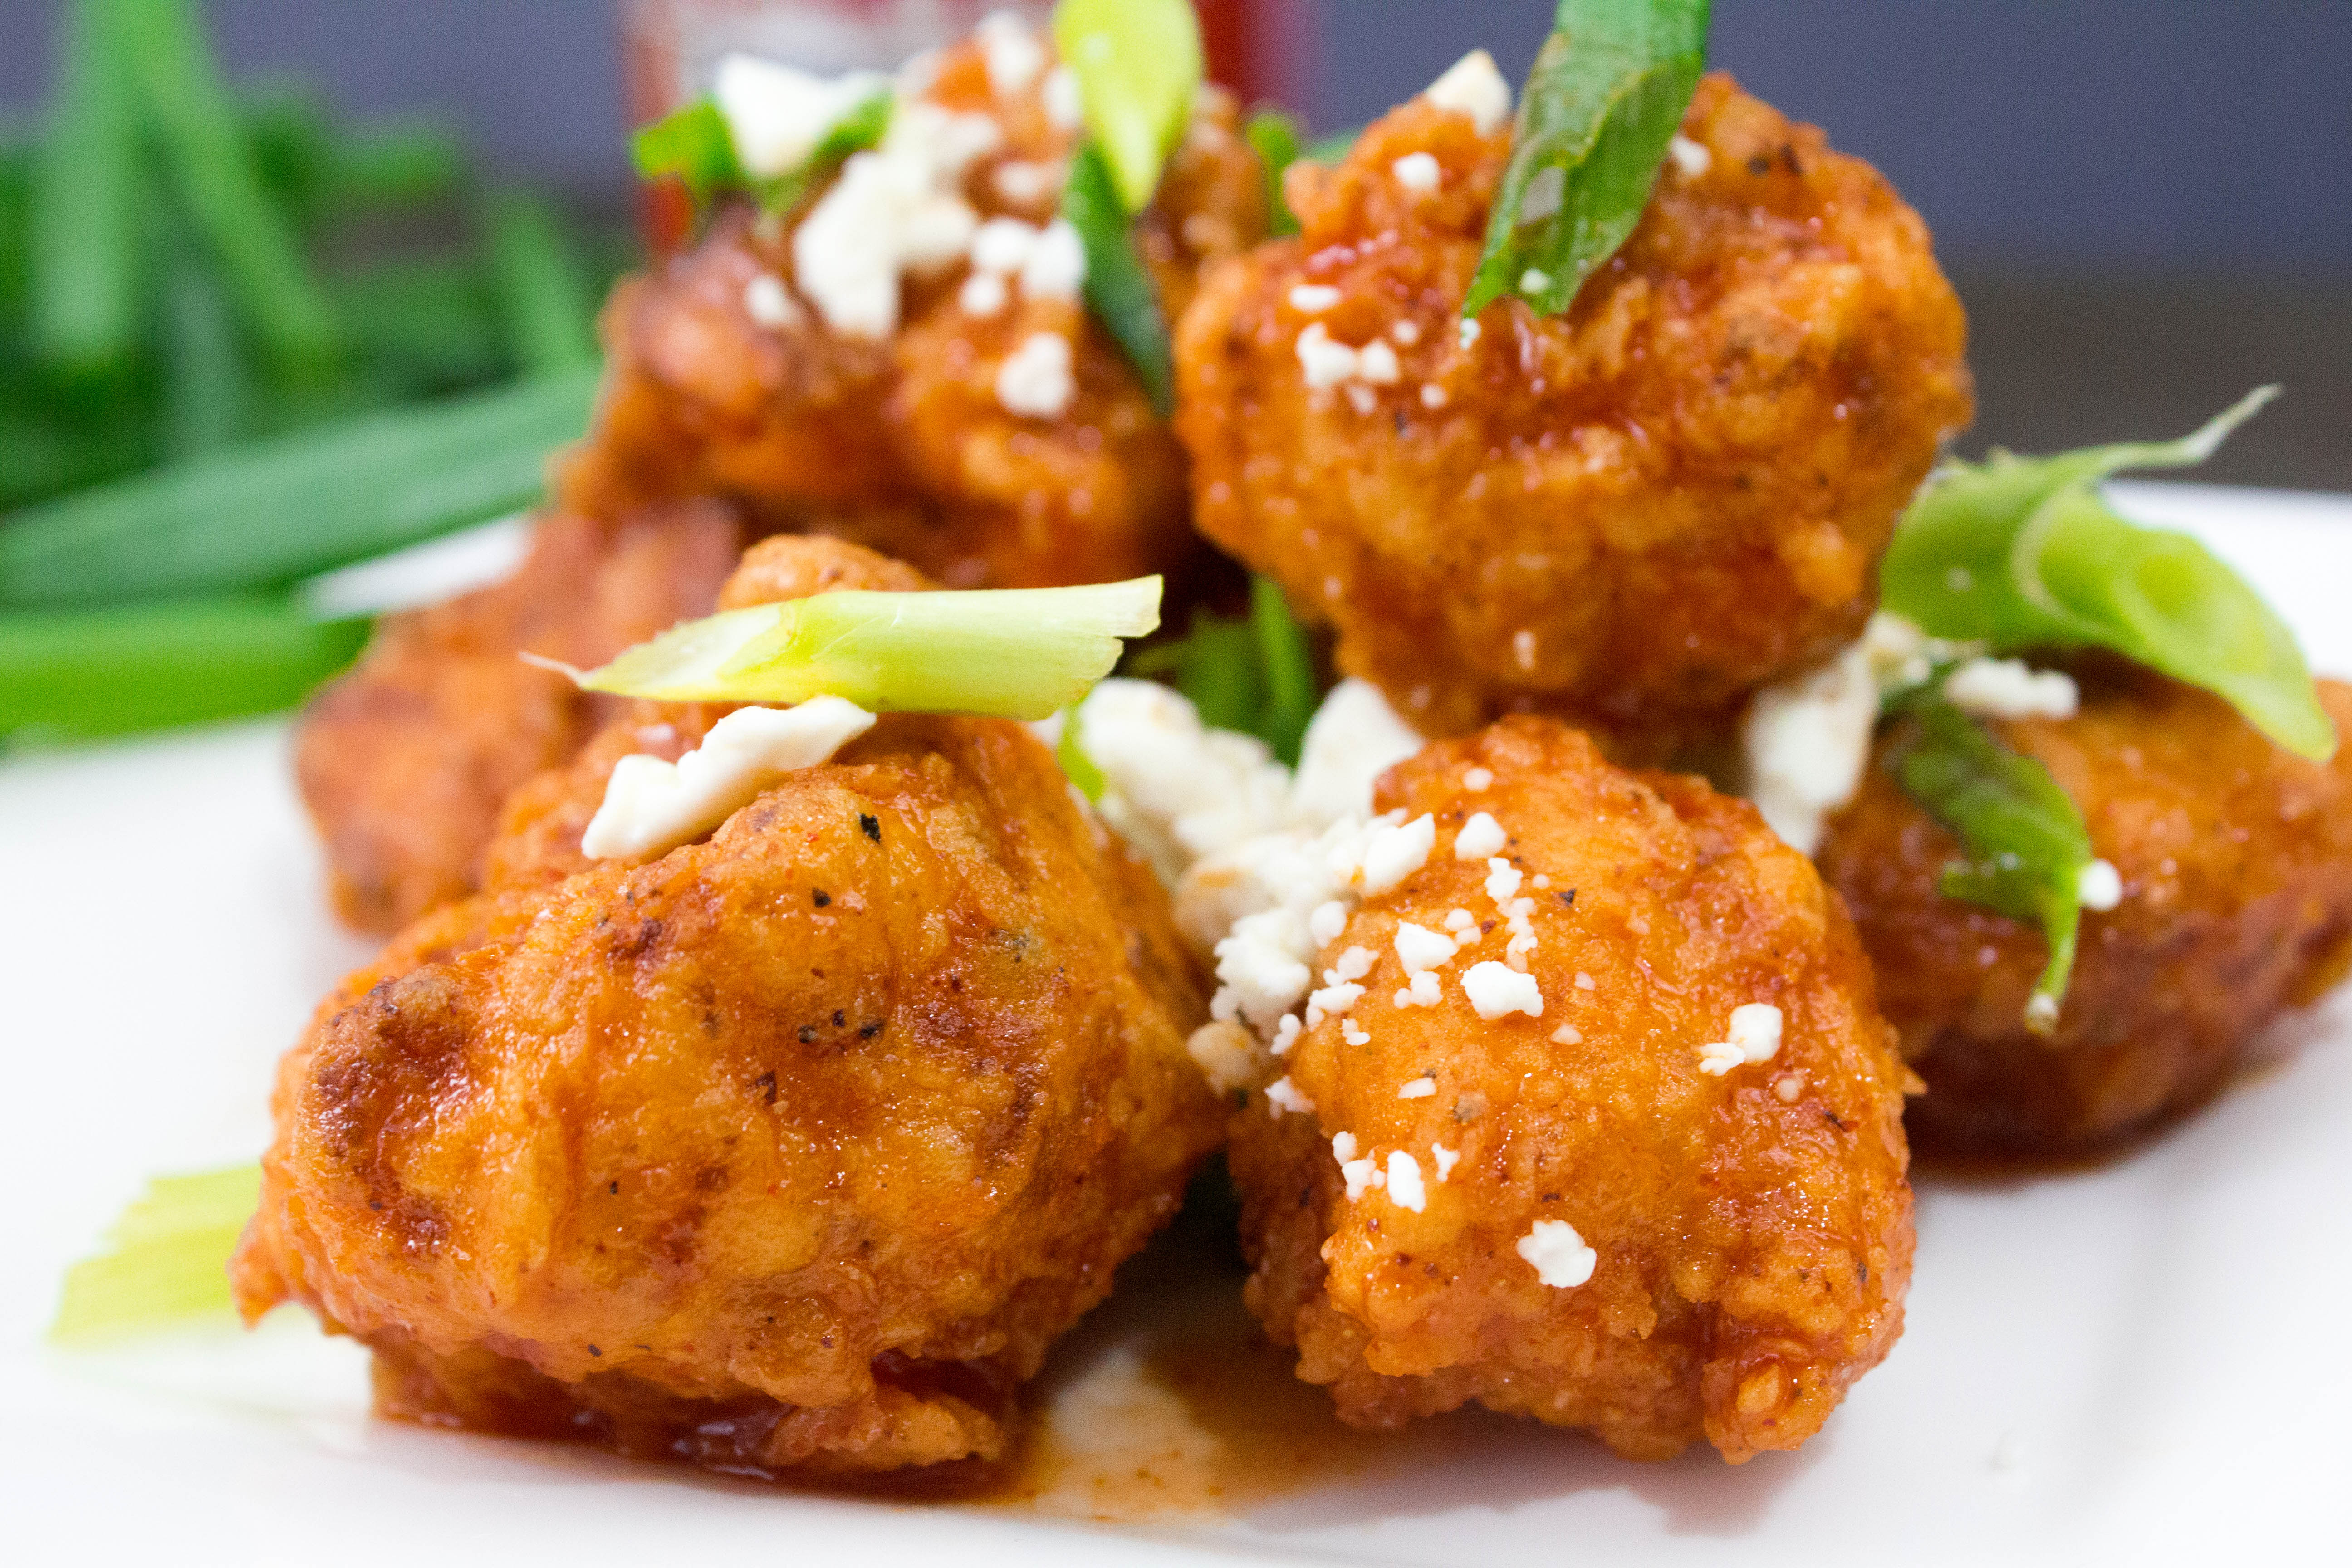 Buffalo Cauliflower California Pizza Kitchen Copycat Recipe